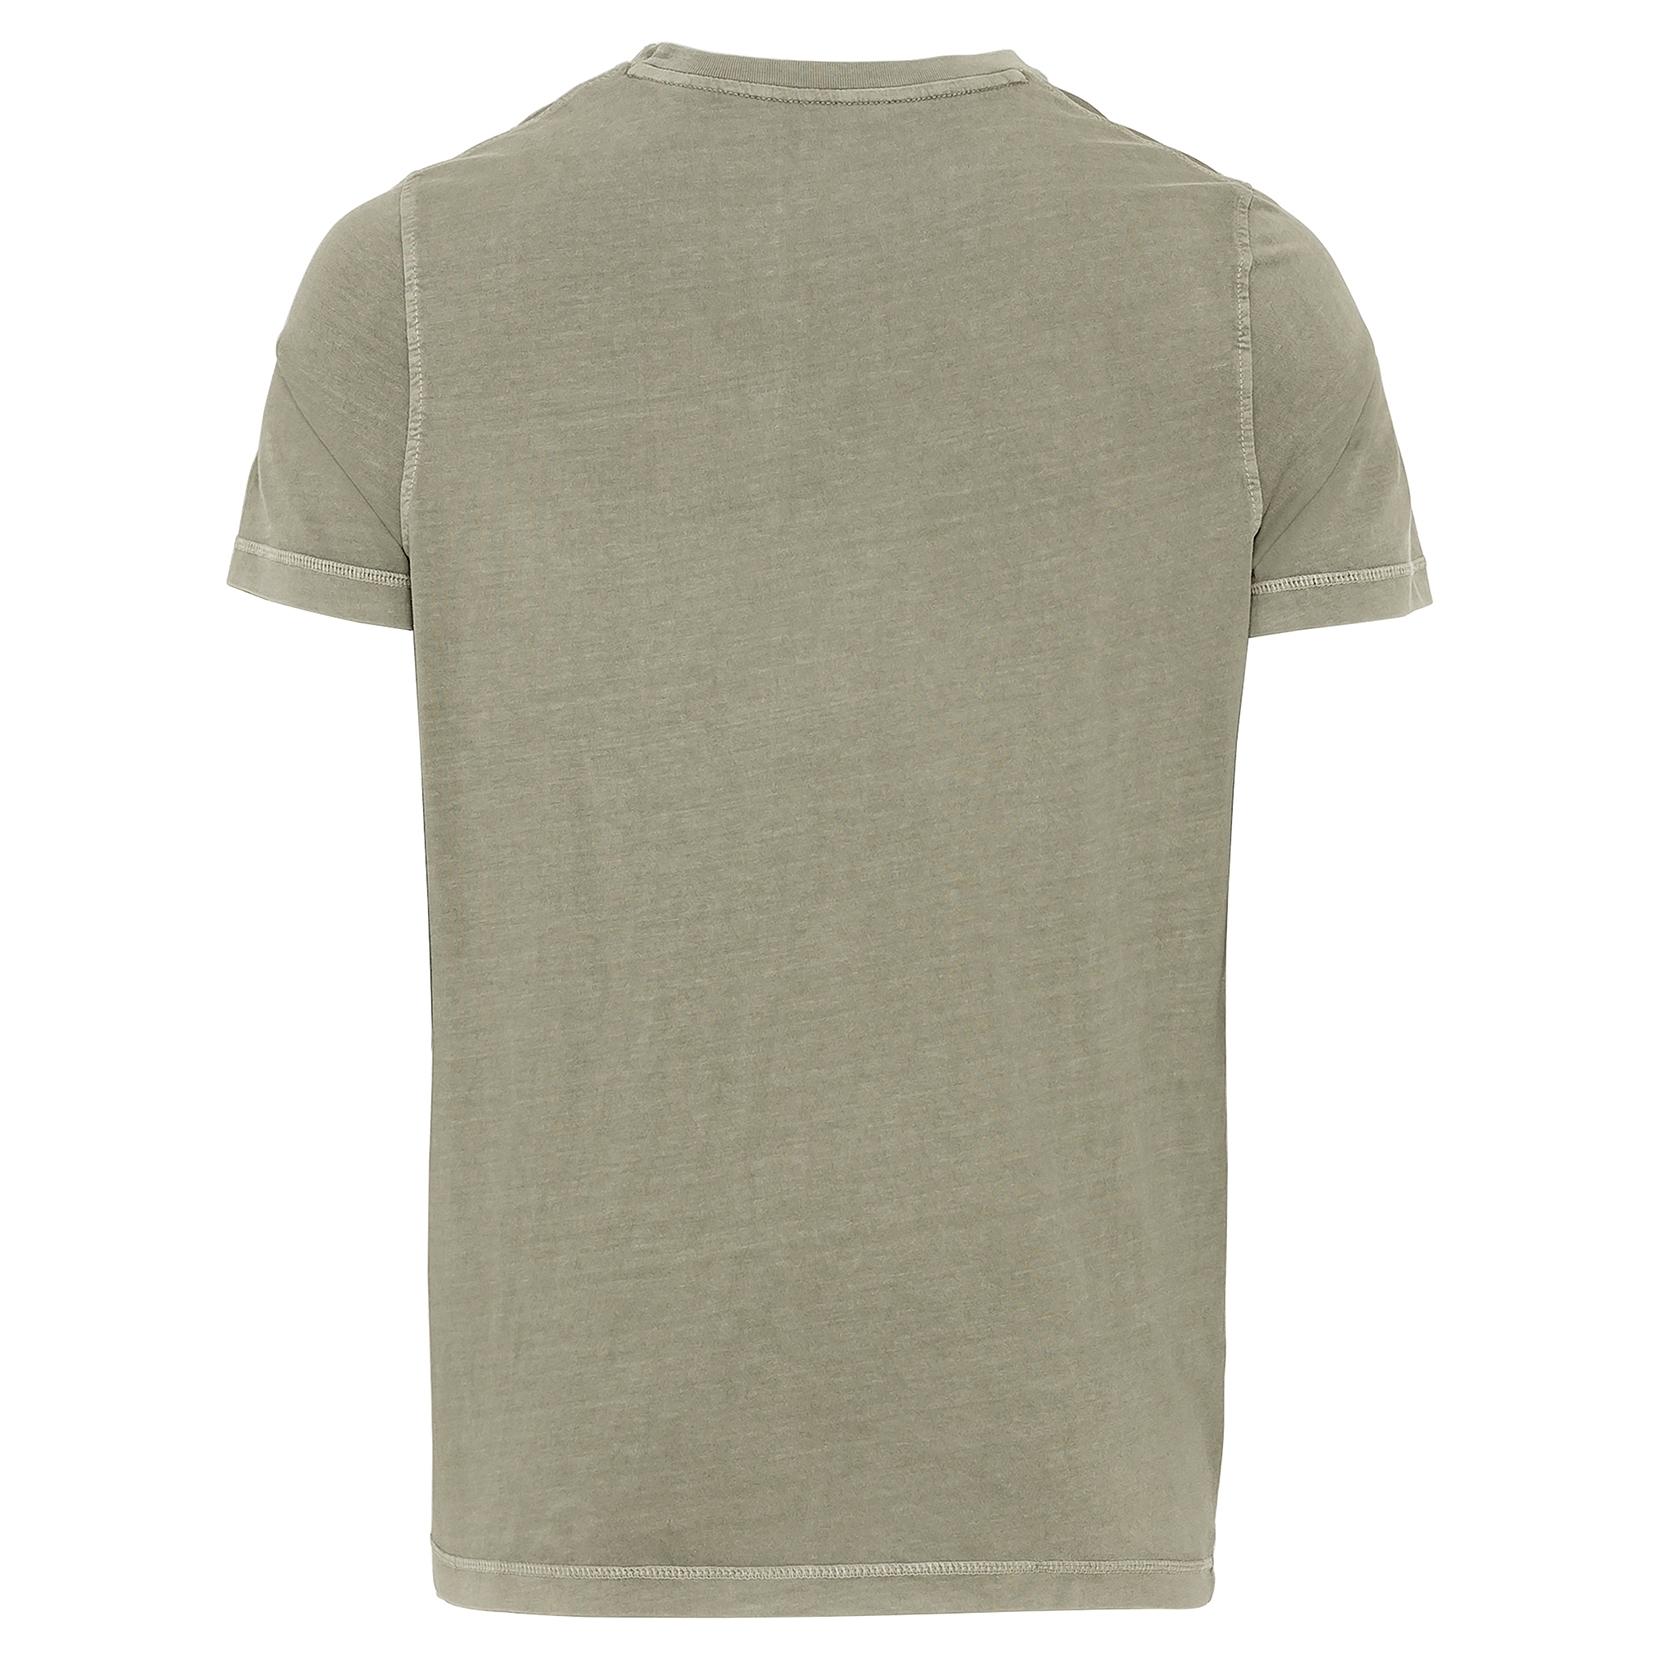 Camel active Herren T-Shirt Shirt kurzarm Print Khaki grün 5T46409646 31